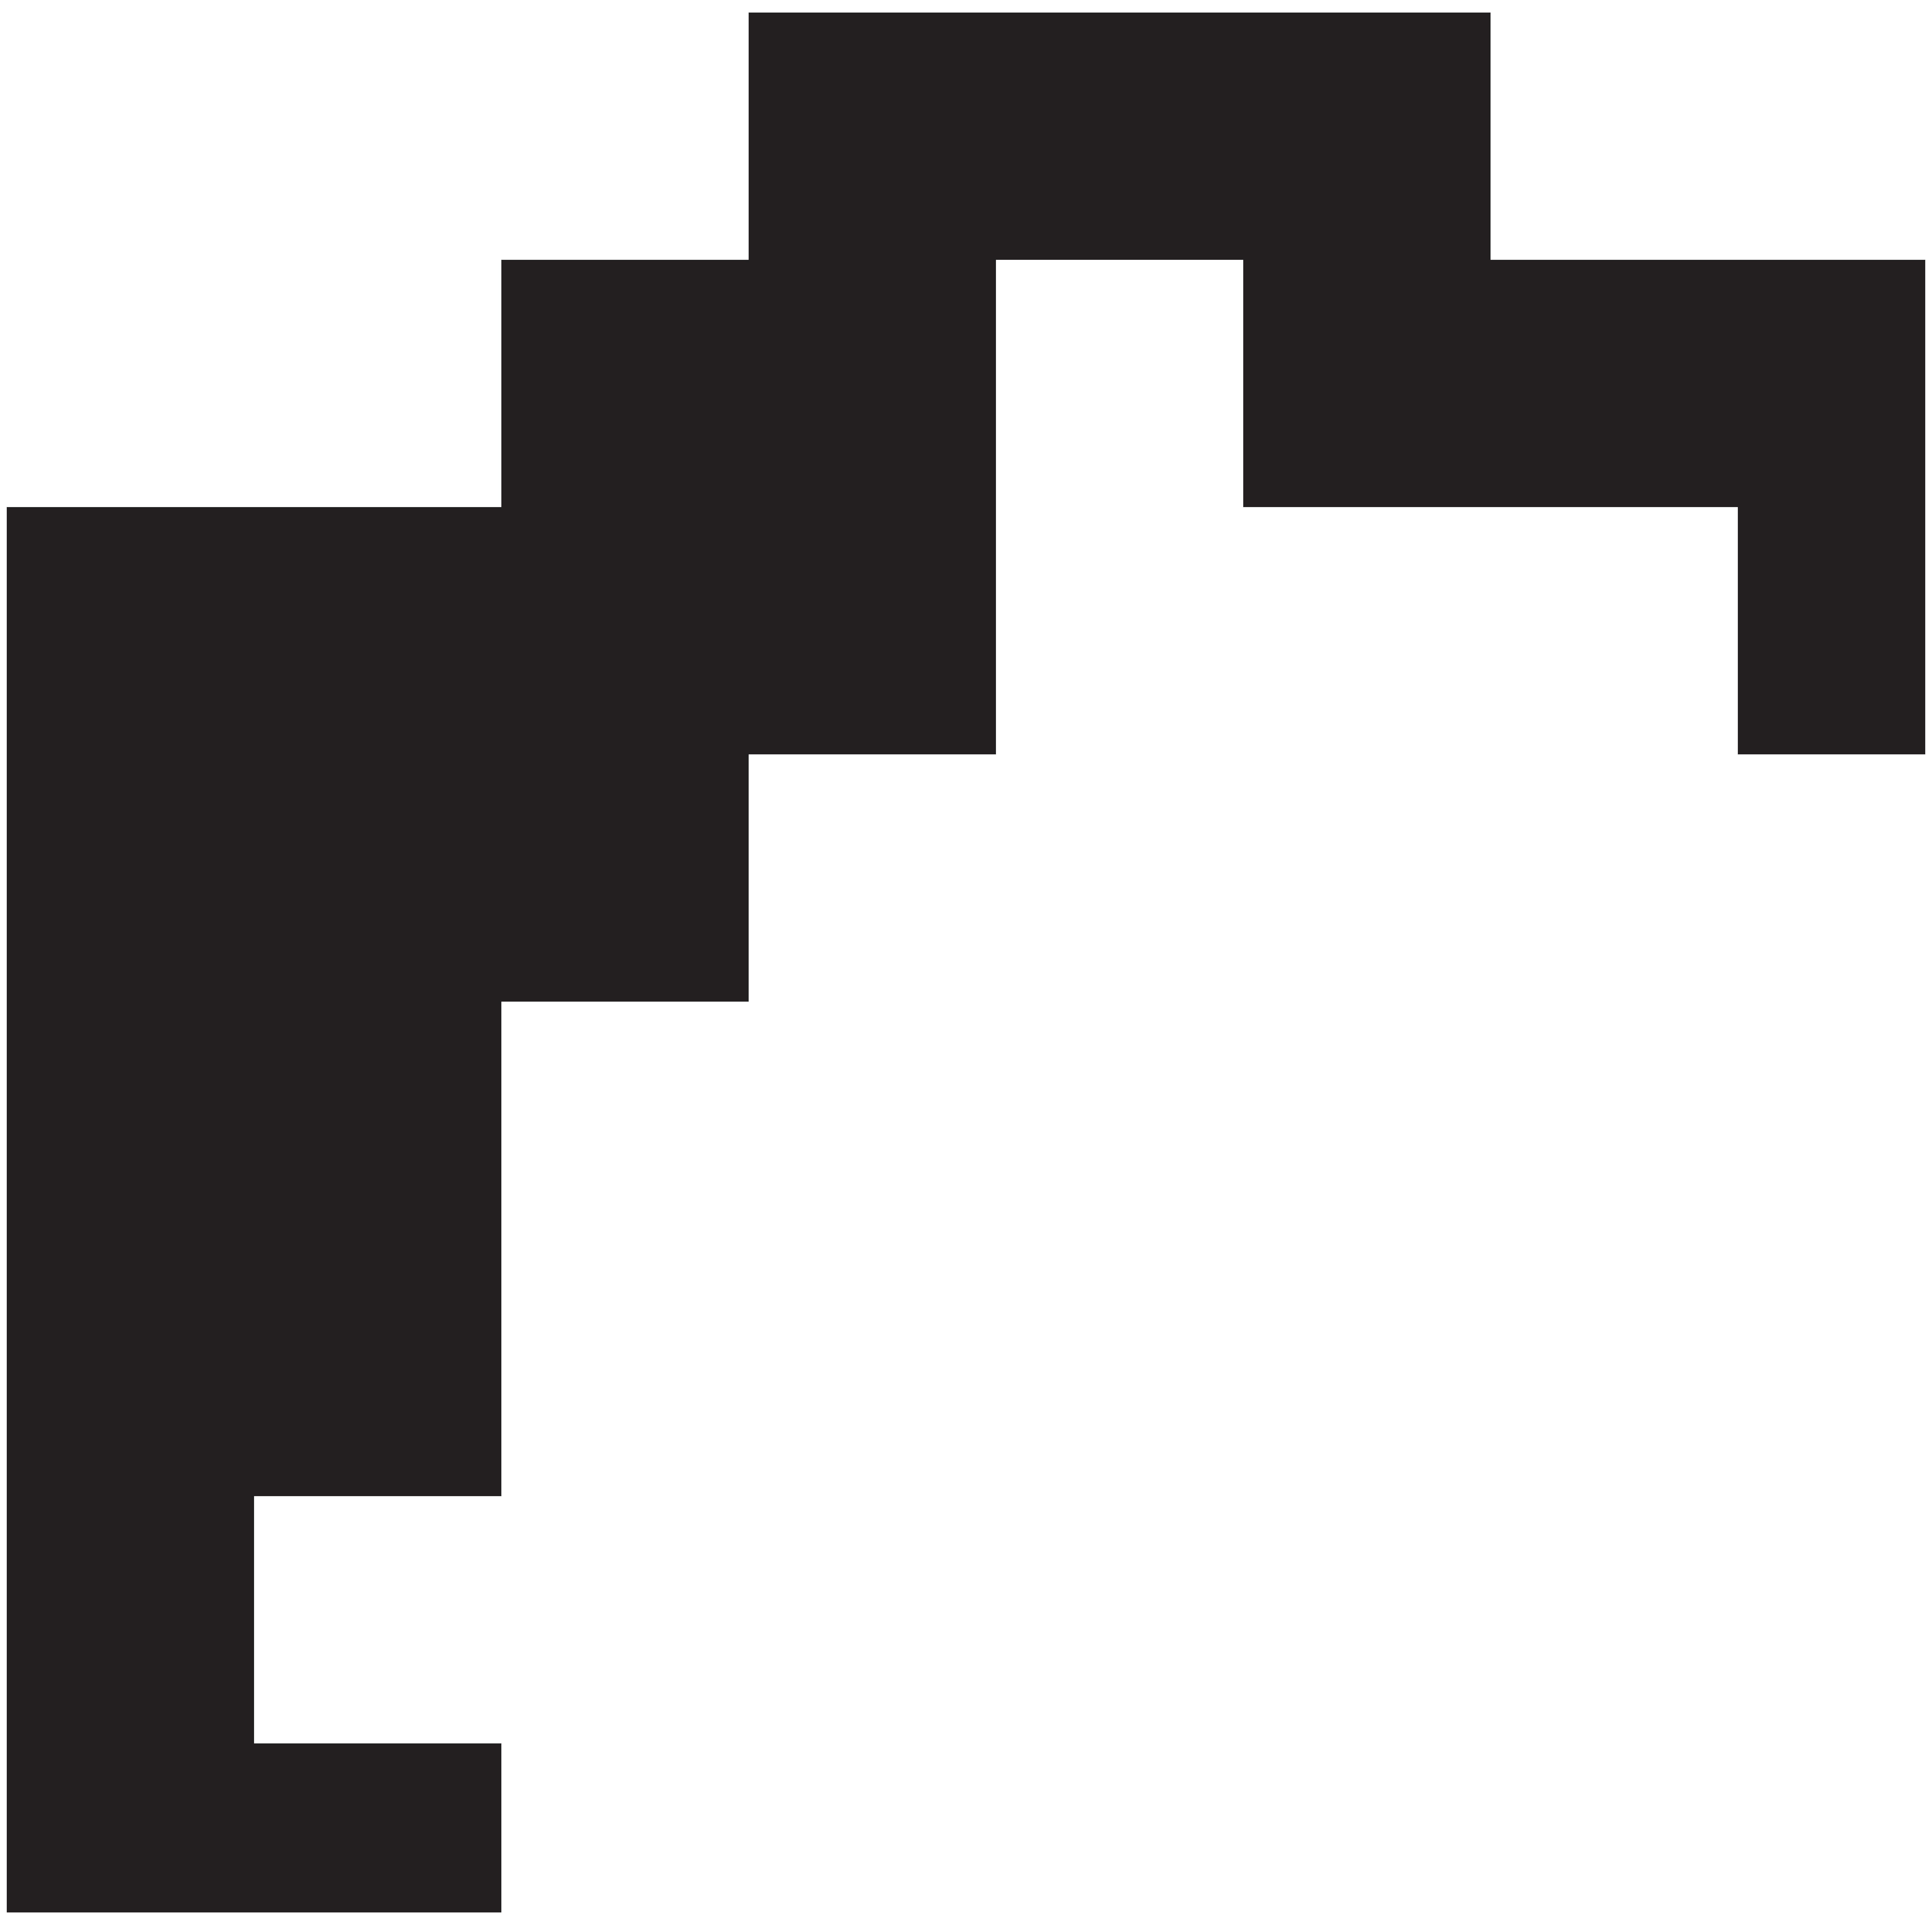 8000x7972 Fisherman Silhouette Png Clip Art Imageu200b Gallery Yopriceville